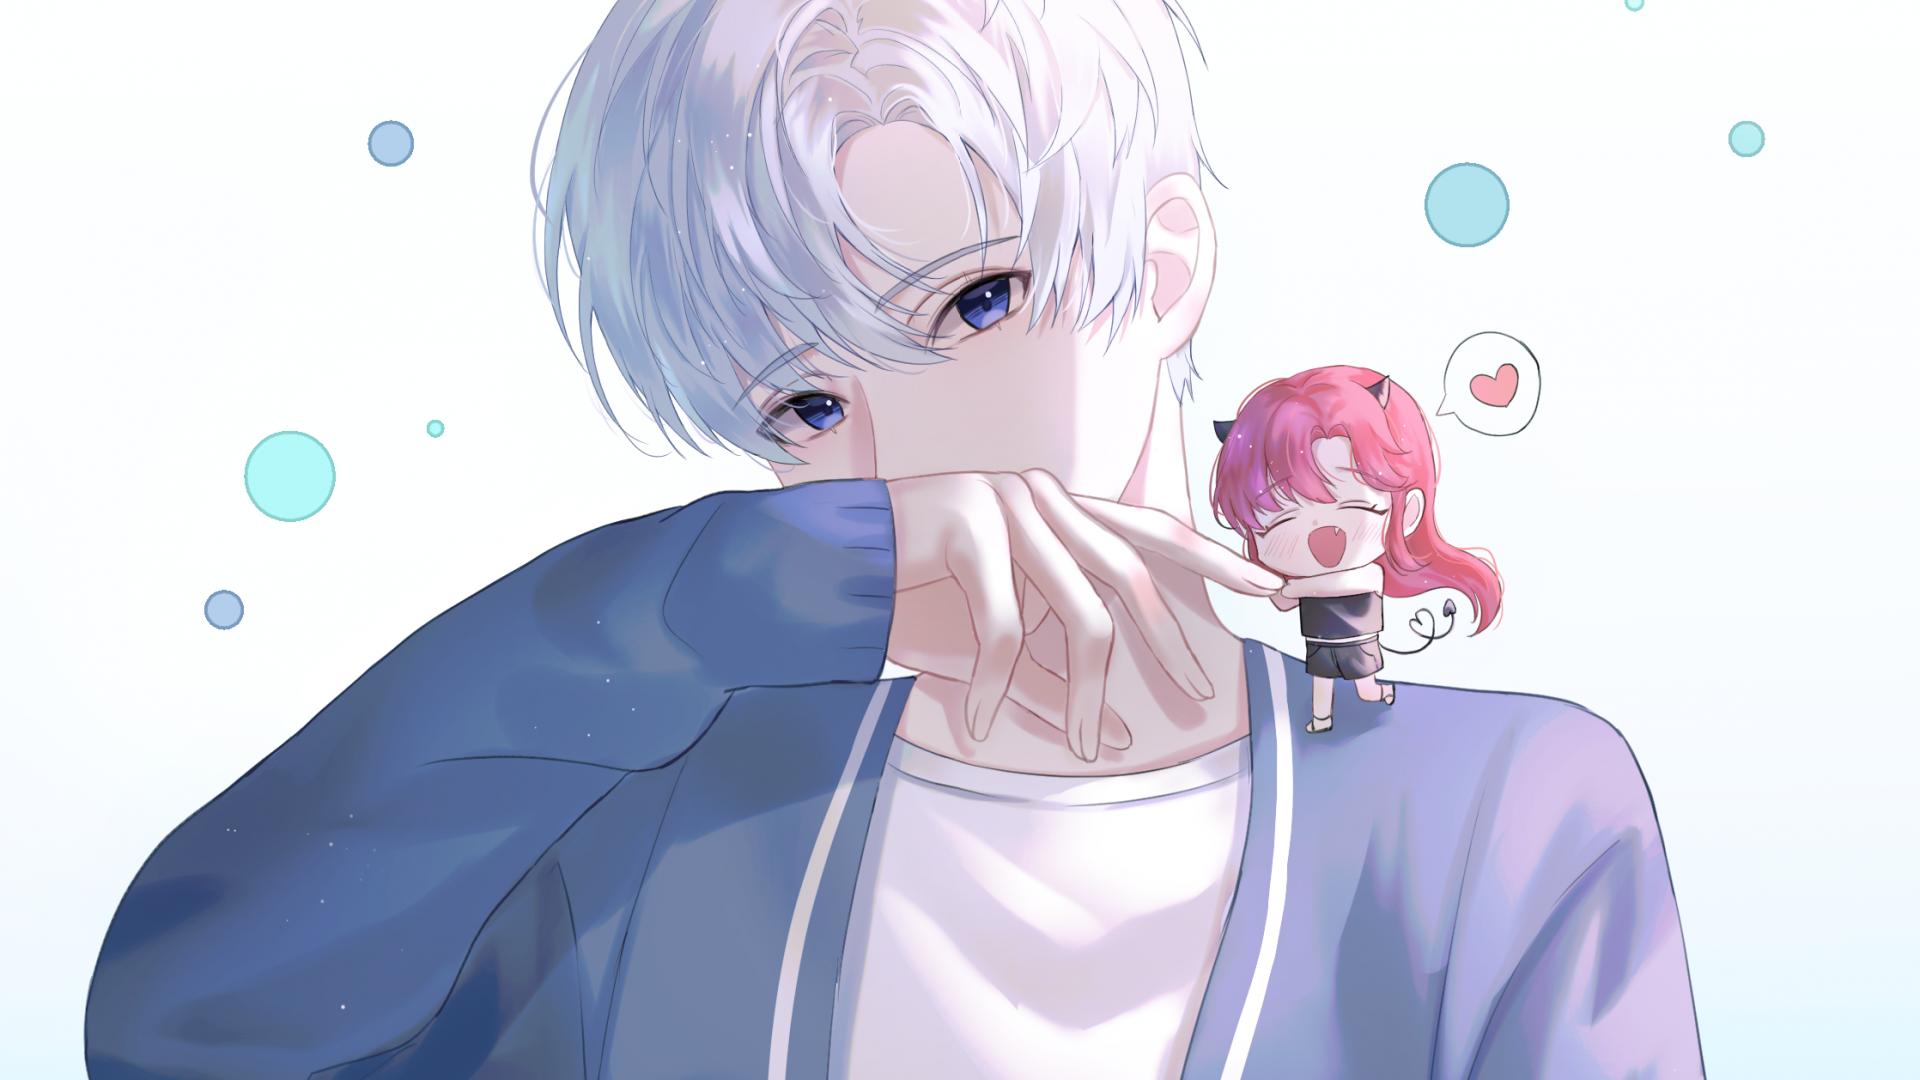 Anime Boy And Girl, Chibi, Cute Friendship - Cute Anime Boy